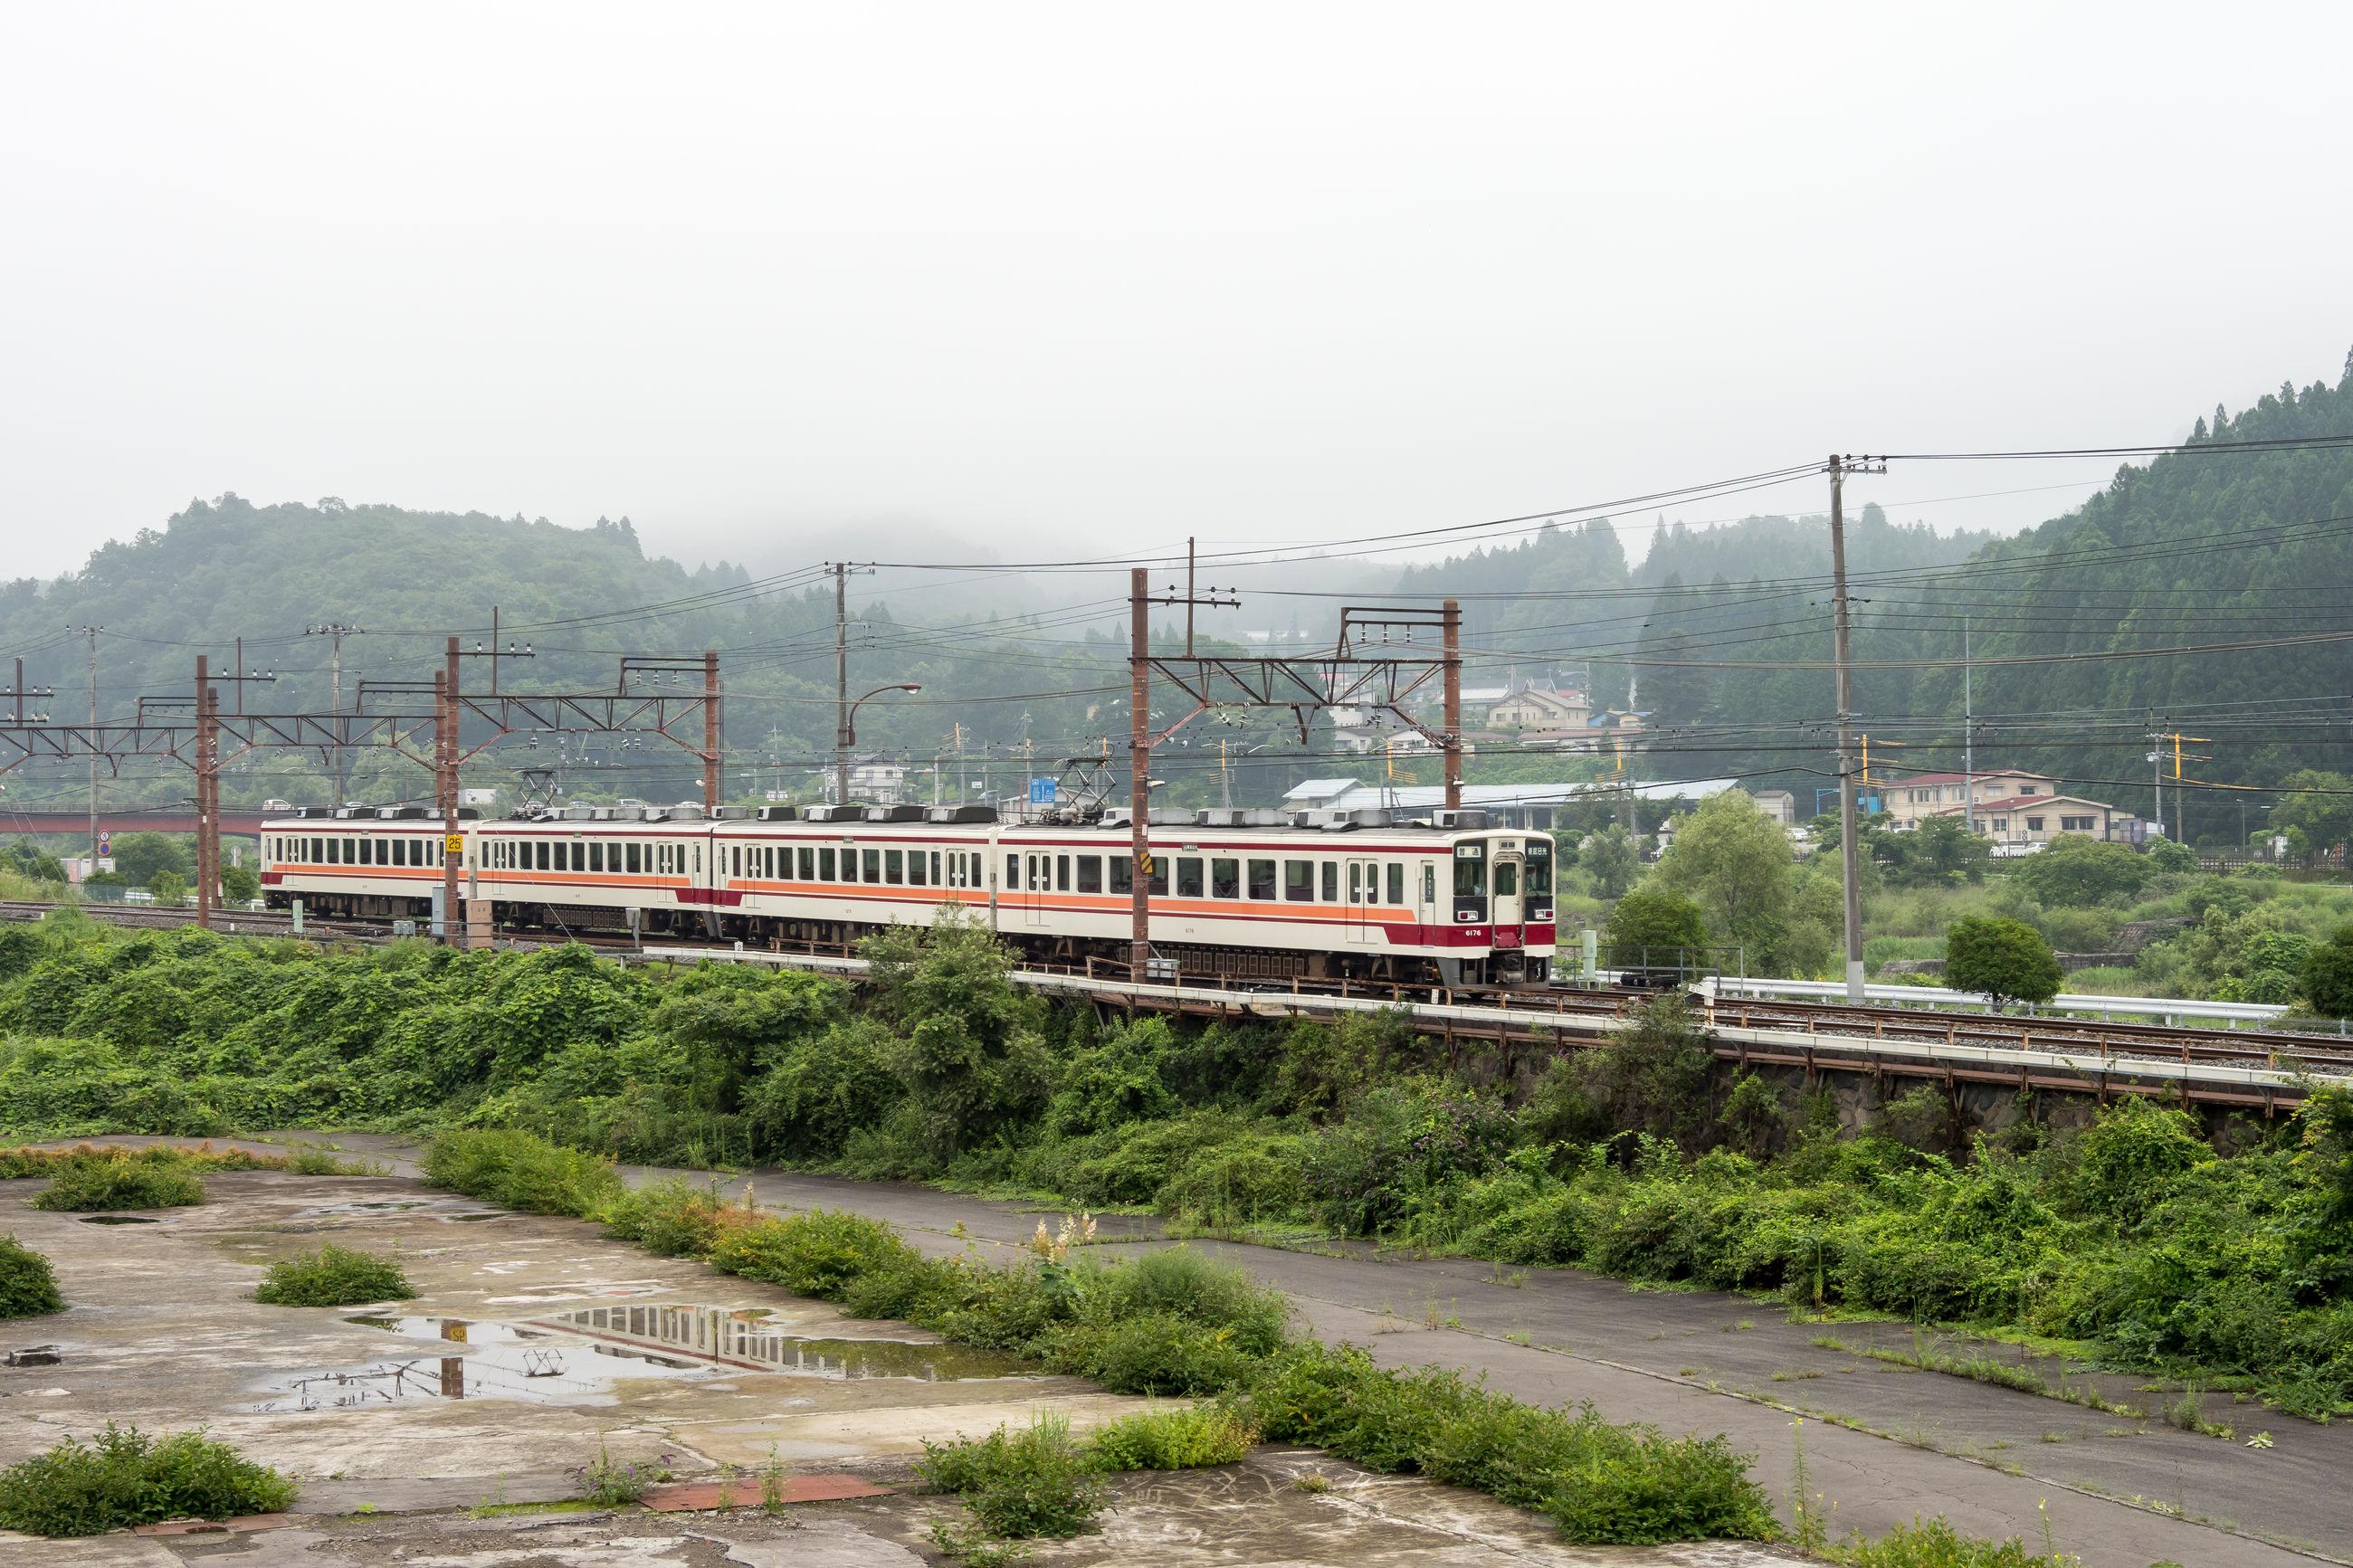 TRAIN ON RAILROAD TRACK IN FOGGY WEATHER